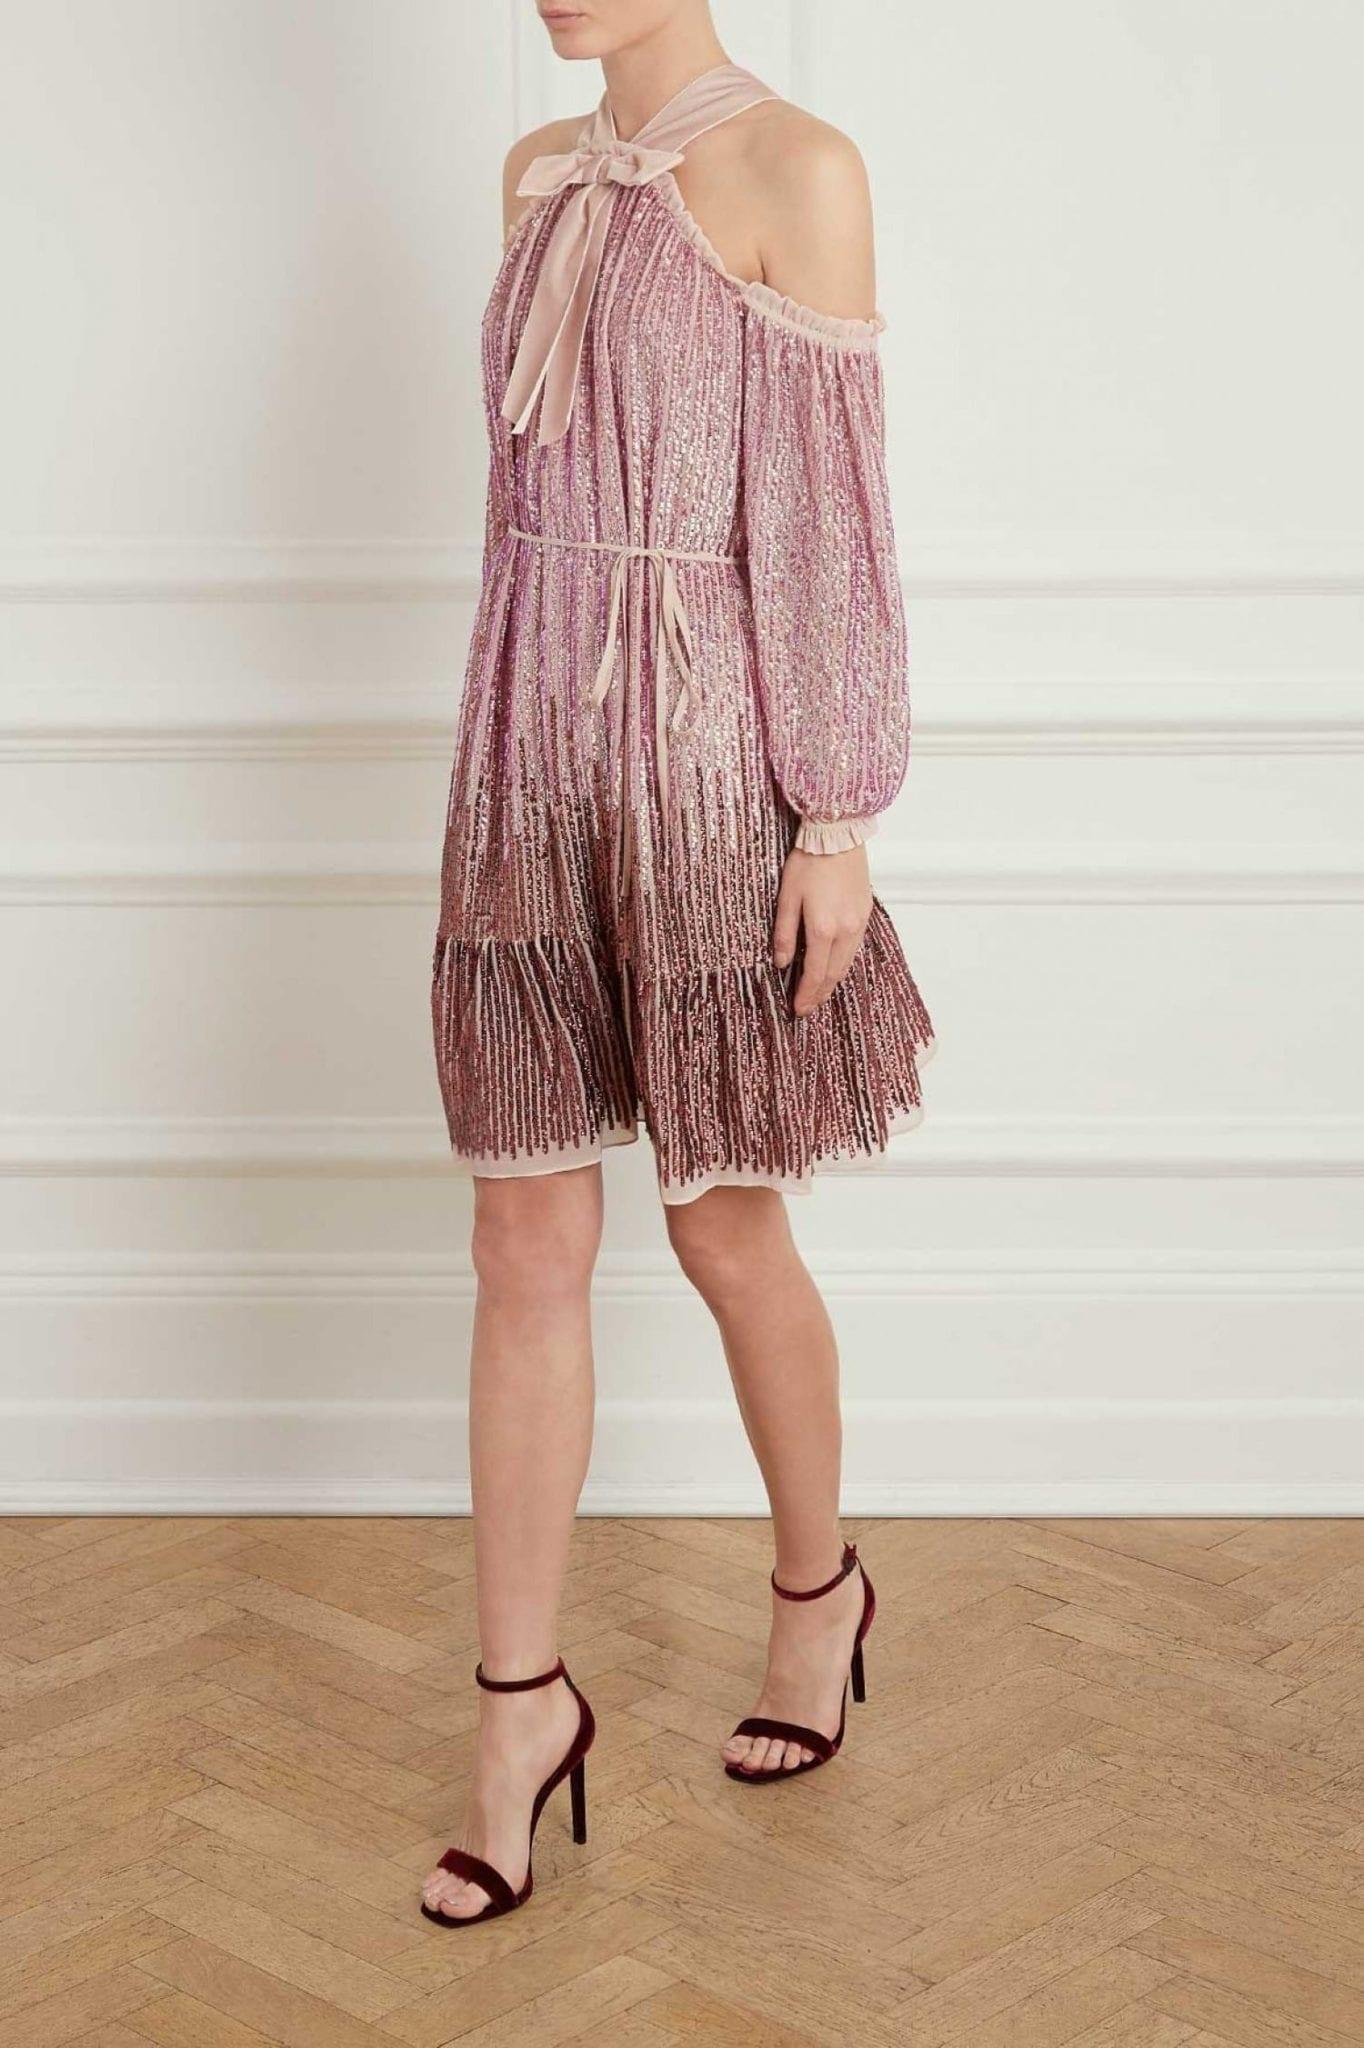 NEEDLE AND THREAD Kaleidoscope Pink Dress